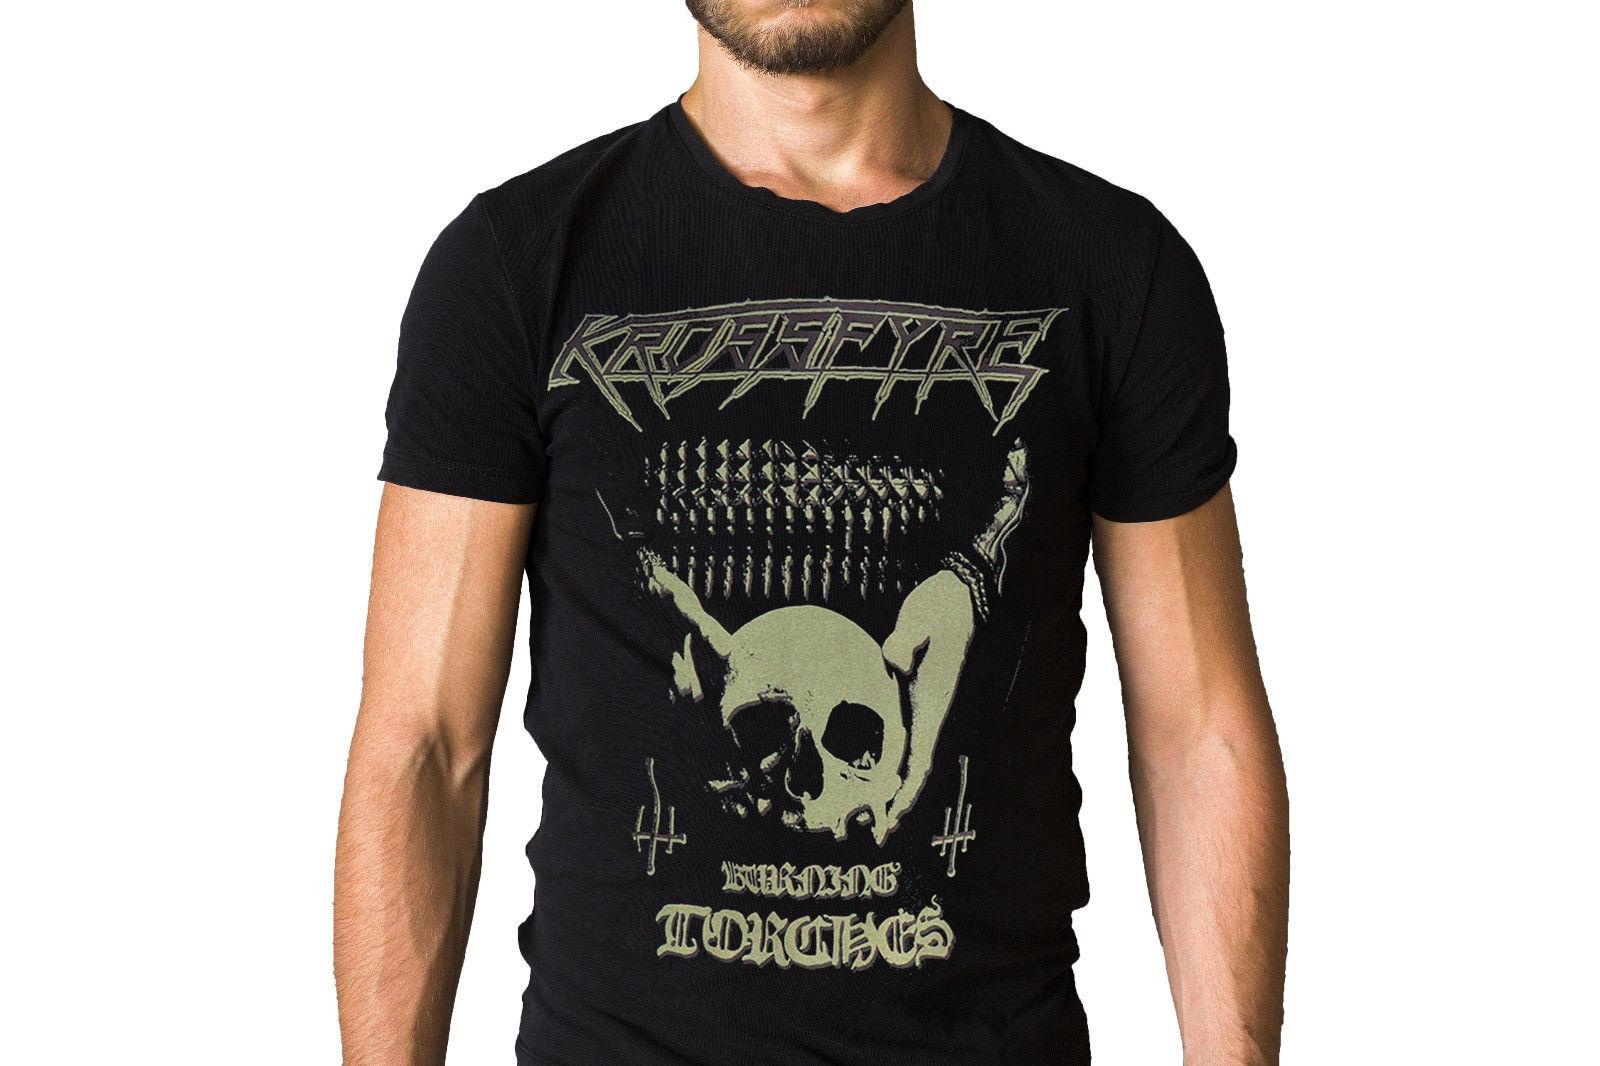 Krossfyre Burning Torches 2017 Logo Album T-Shirt Summer Short Sleeve Shirts Tops S~3Xl Big Size Cotton Tees Free Shipping